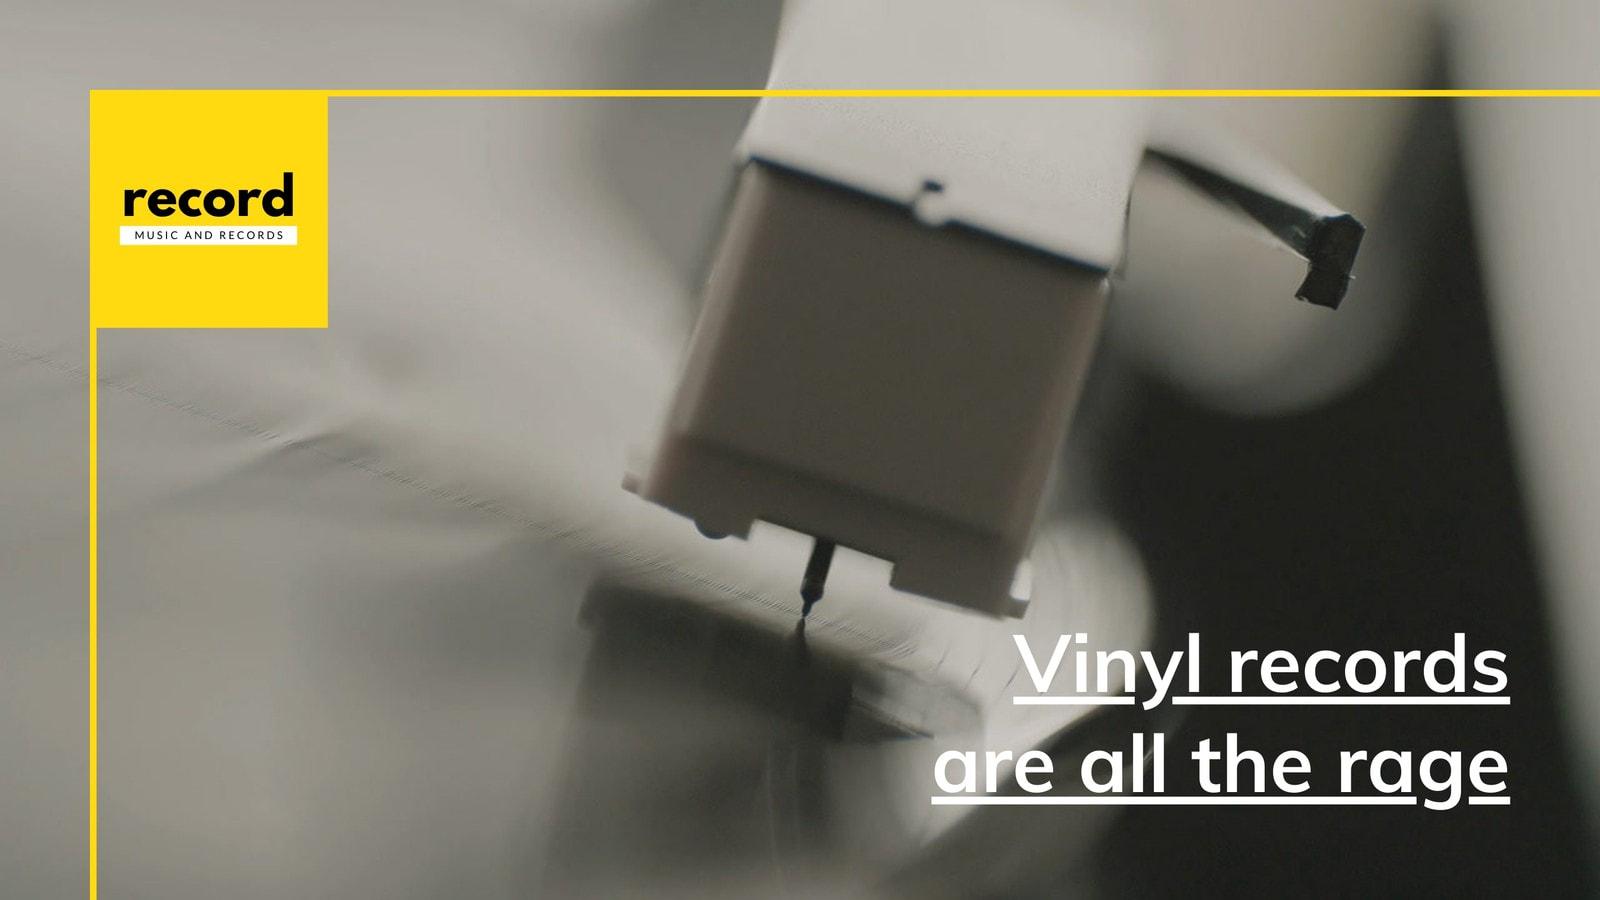 Yellow Minimalist Online Music Streaming YouTube Video Ad